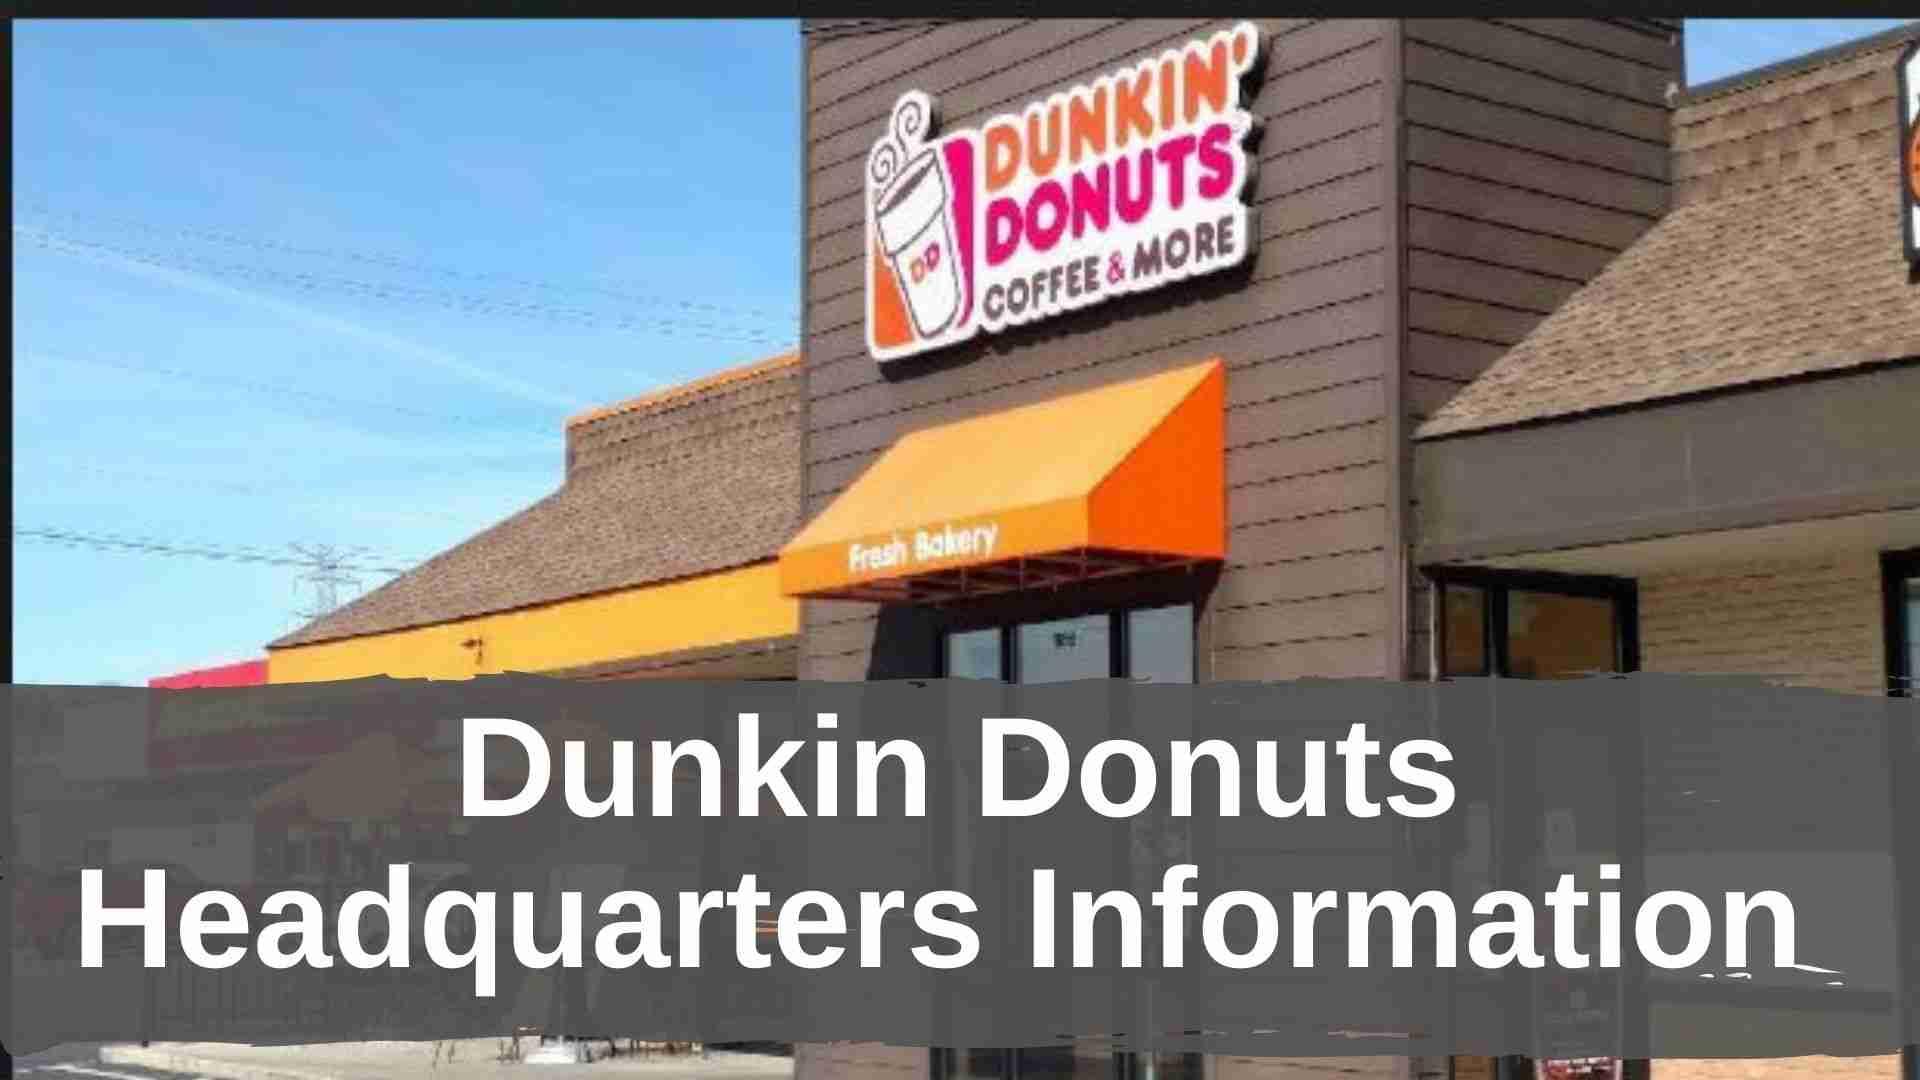 Dunkin Donuts Headquarters Information